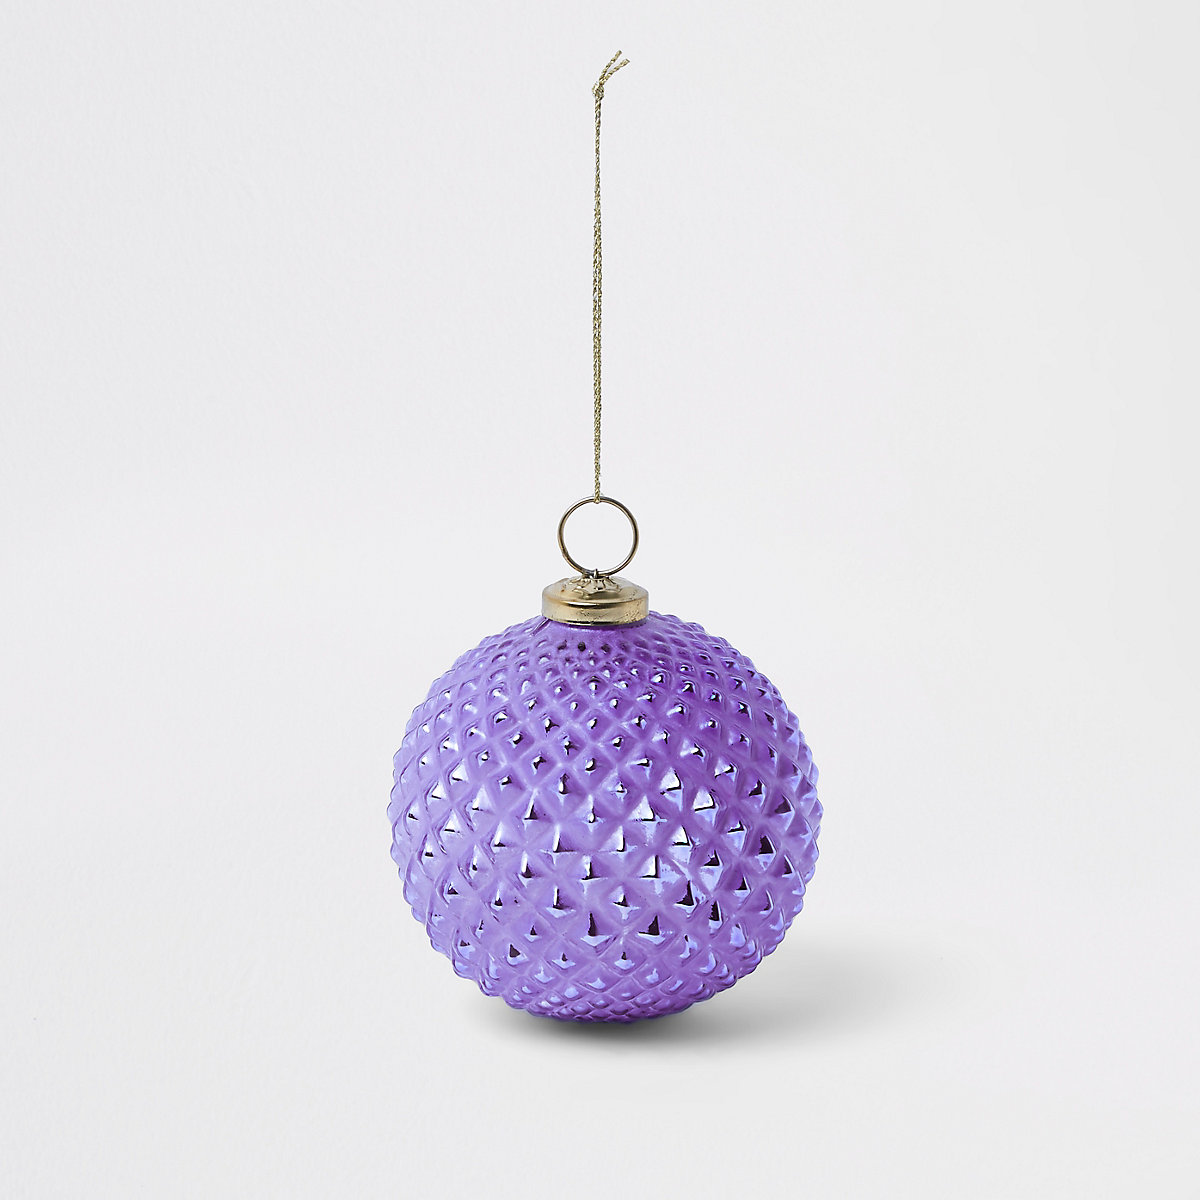 Large purple metallic bauble